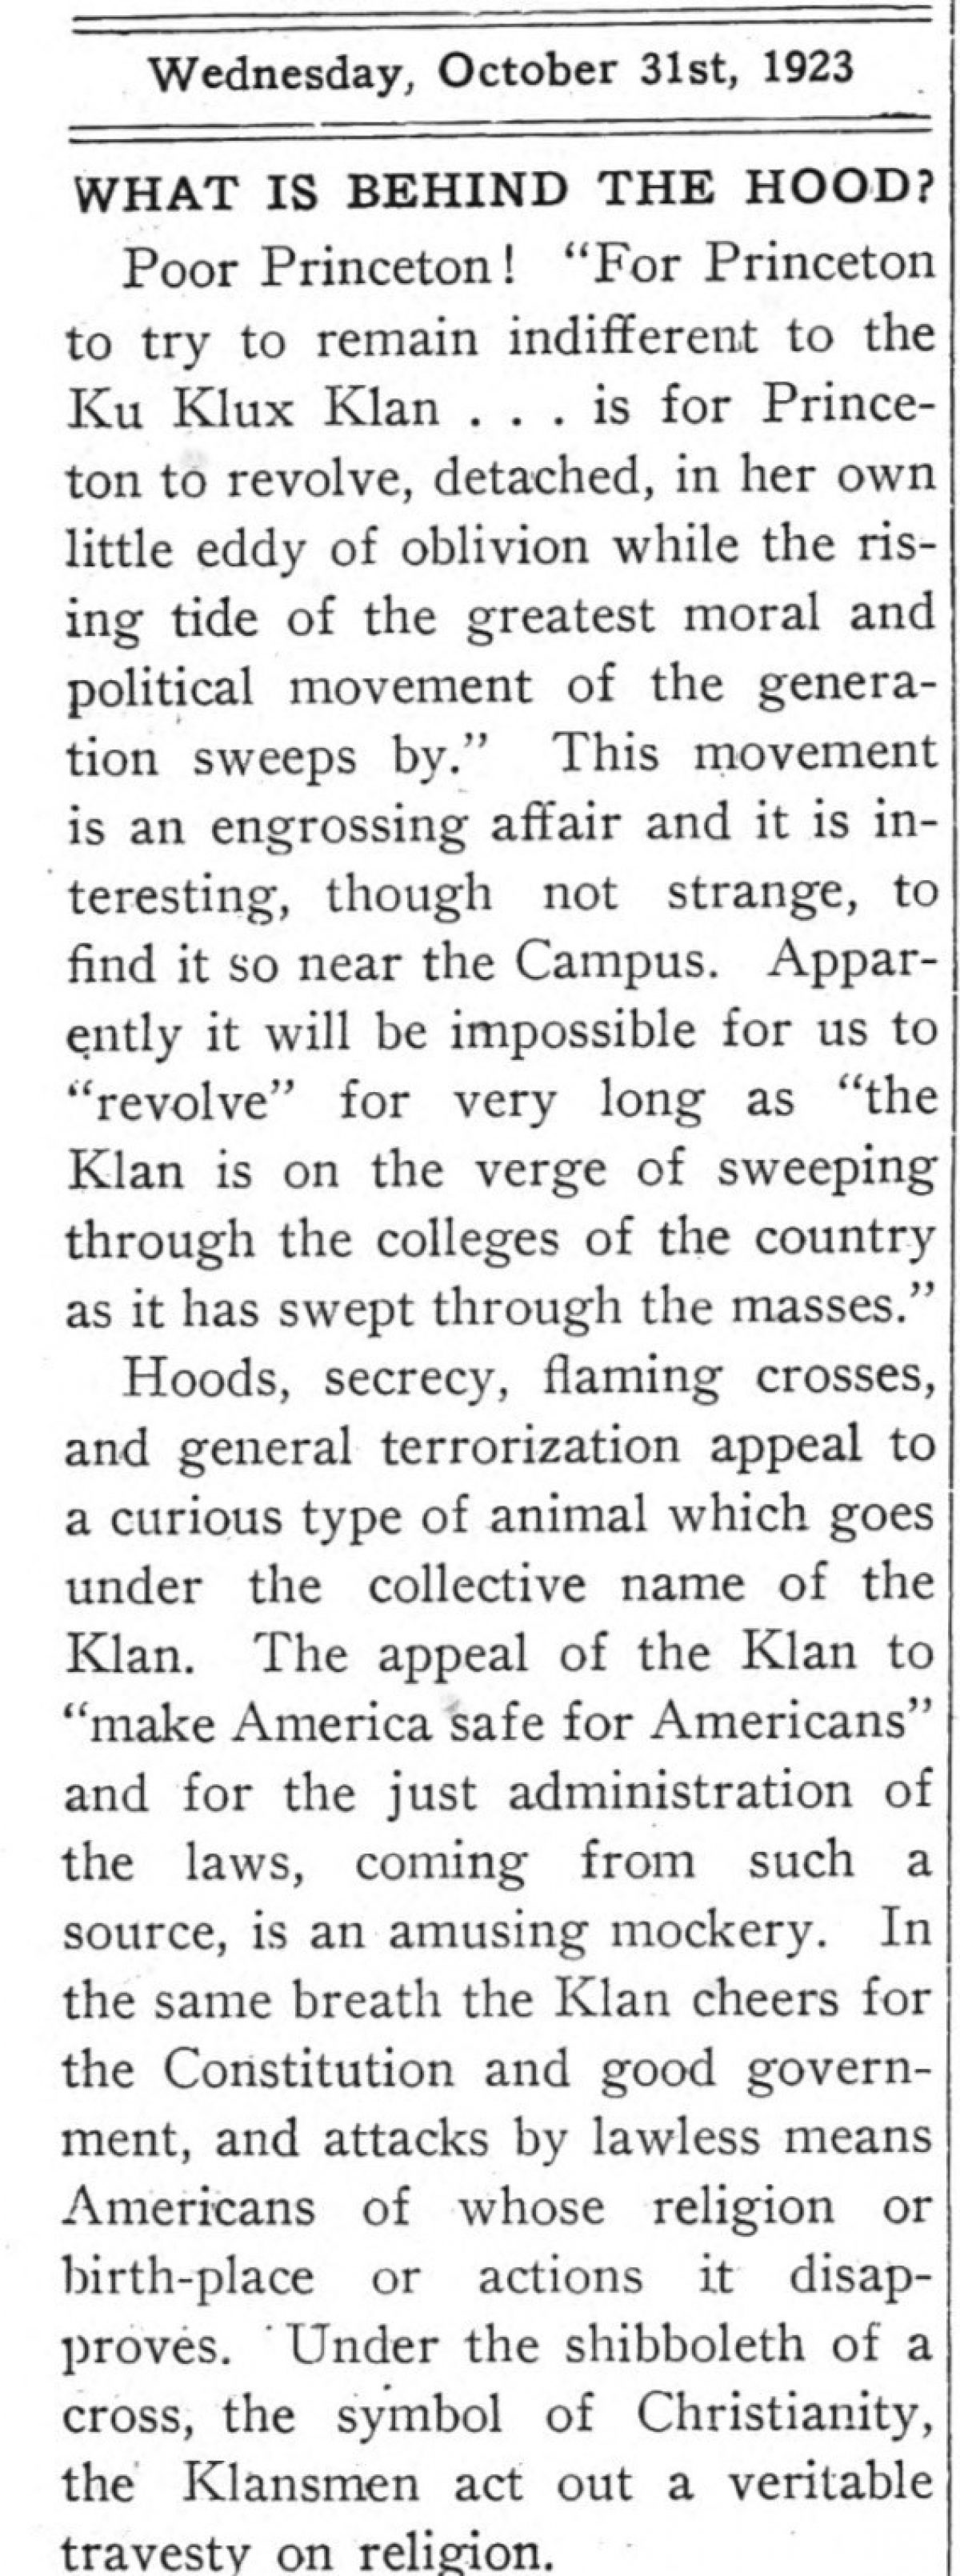 Daily Princetonian 31 Oct 1923 Behind the Hood crop